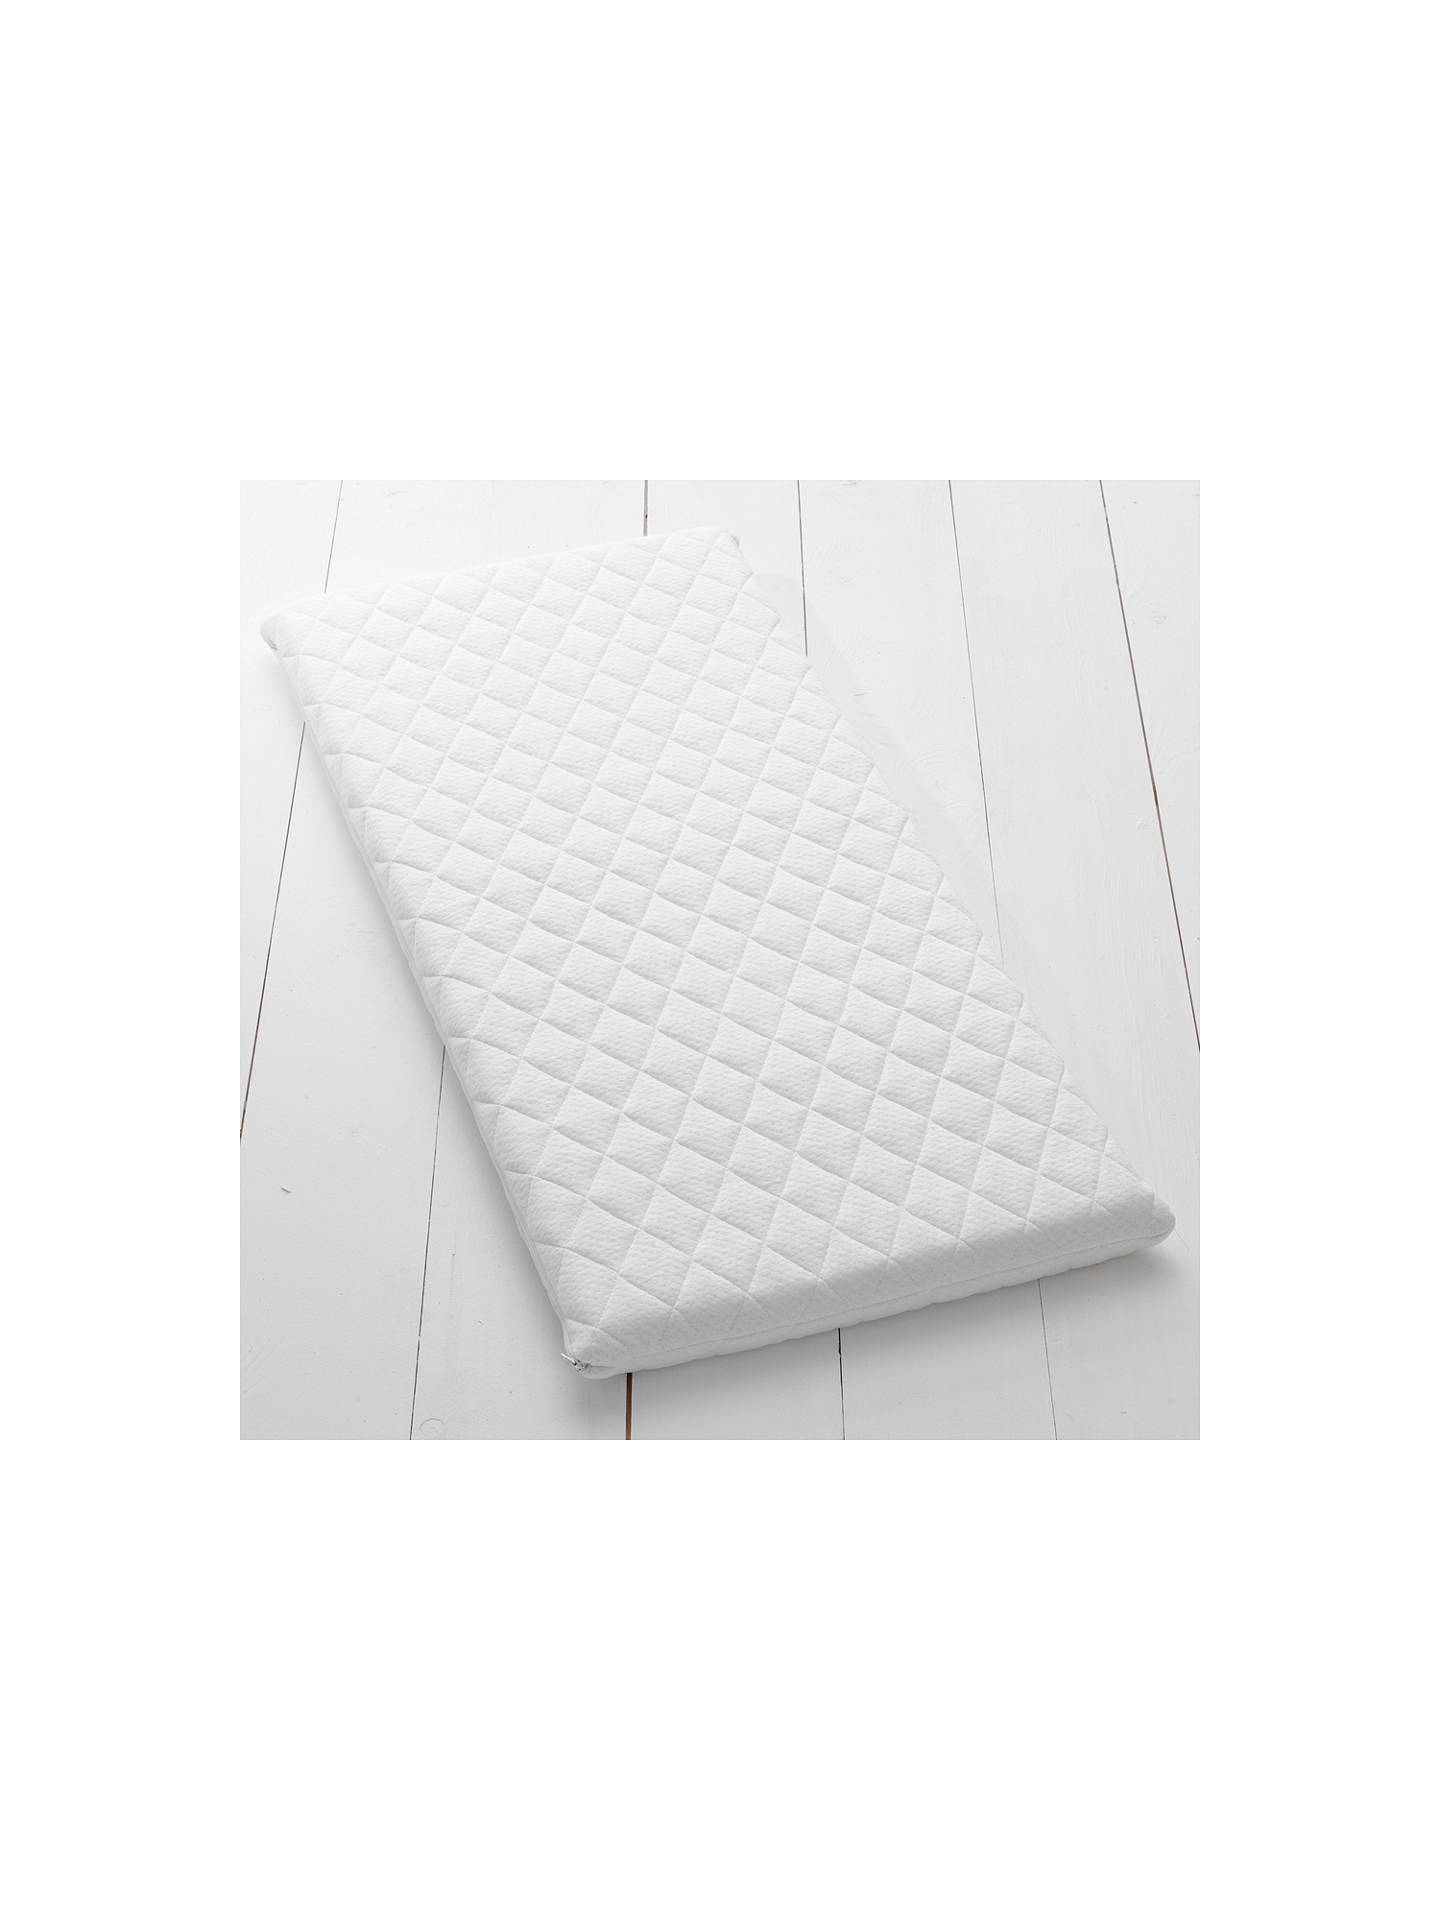 John Lewis Amp Partners Premium Foam Crib Mattress 80 5 X